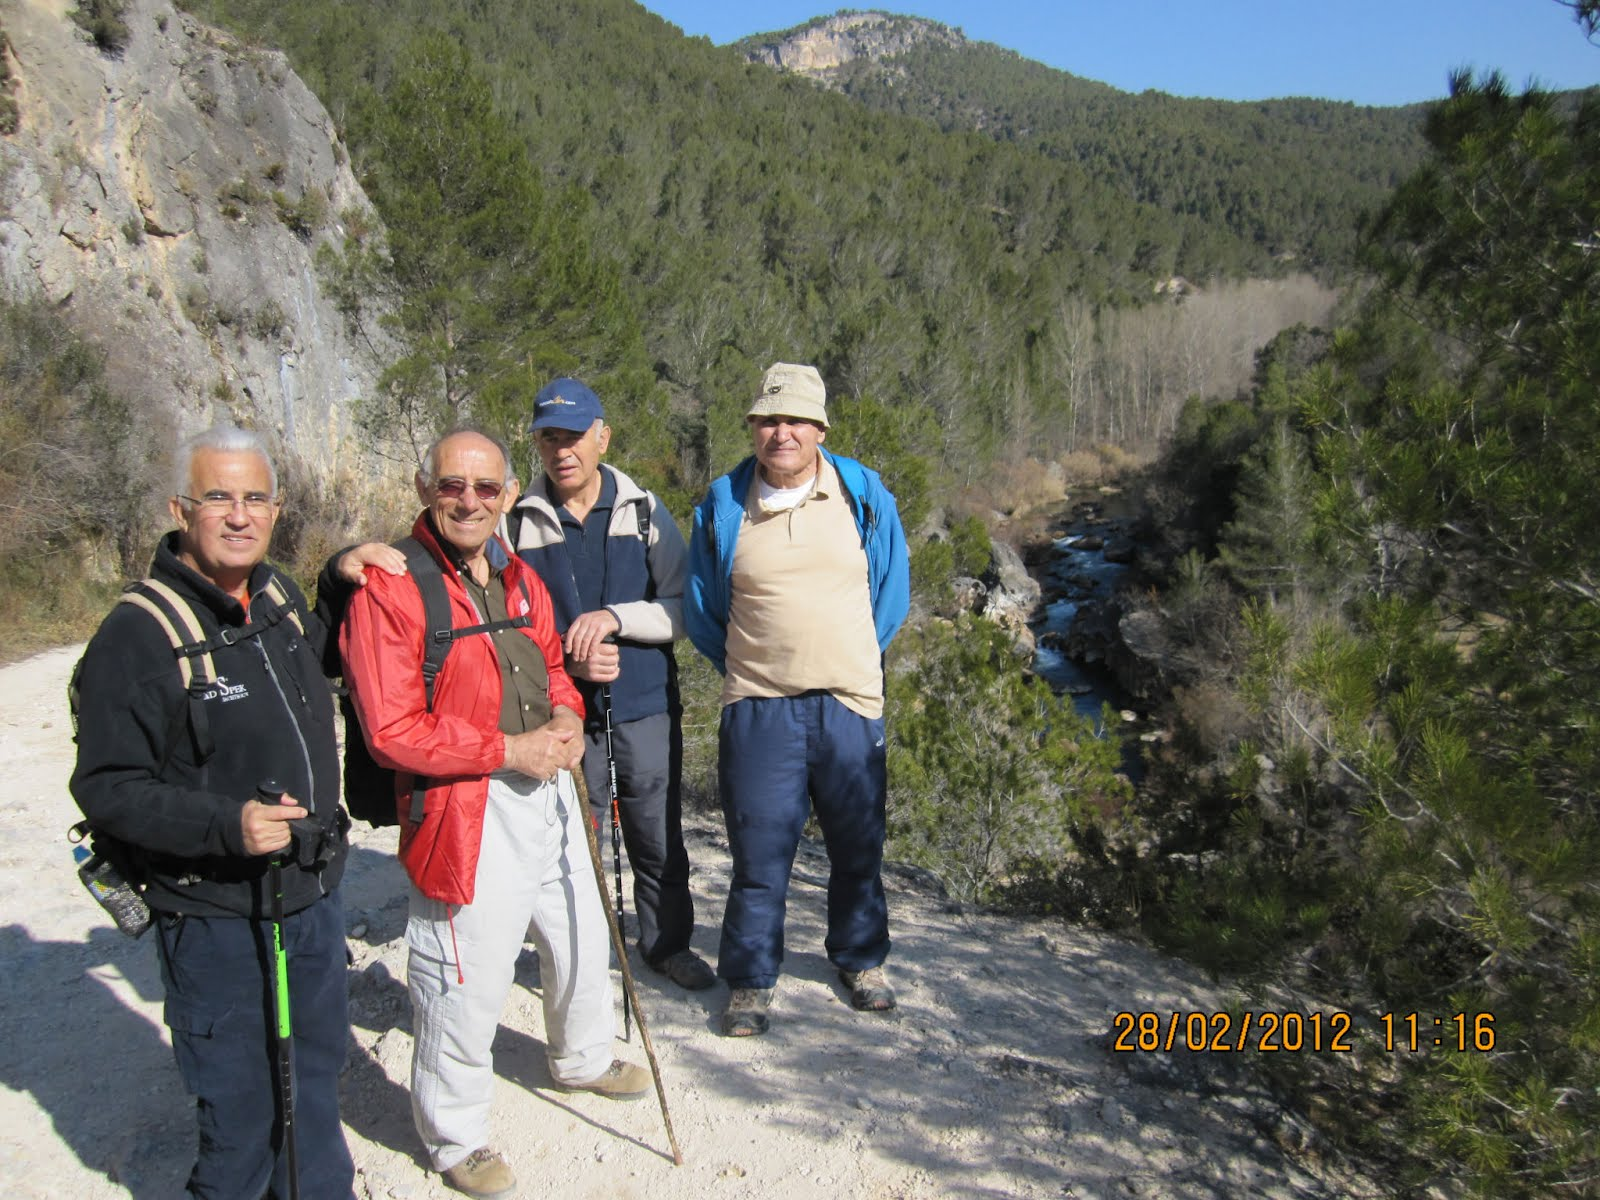 alto checo salida en Torrejón de Ardoz